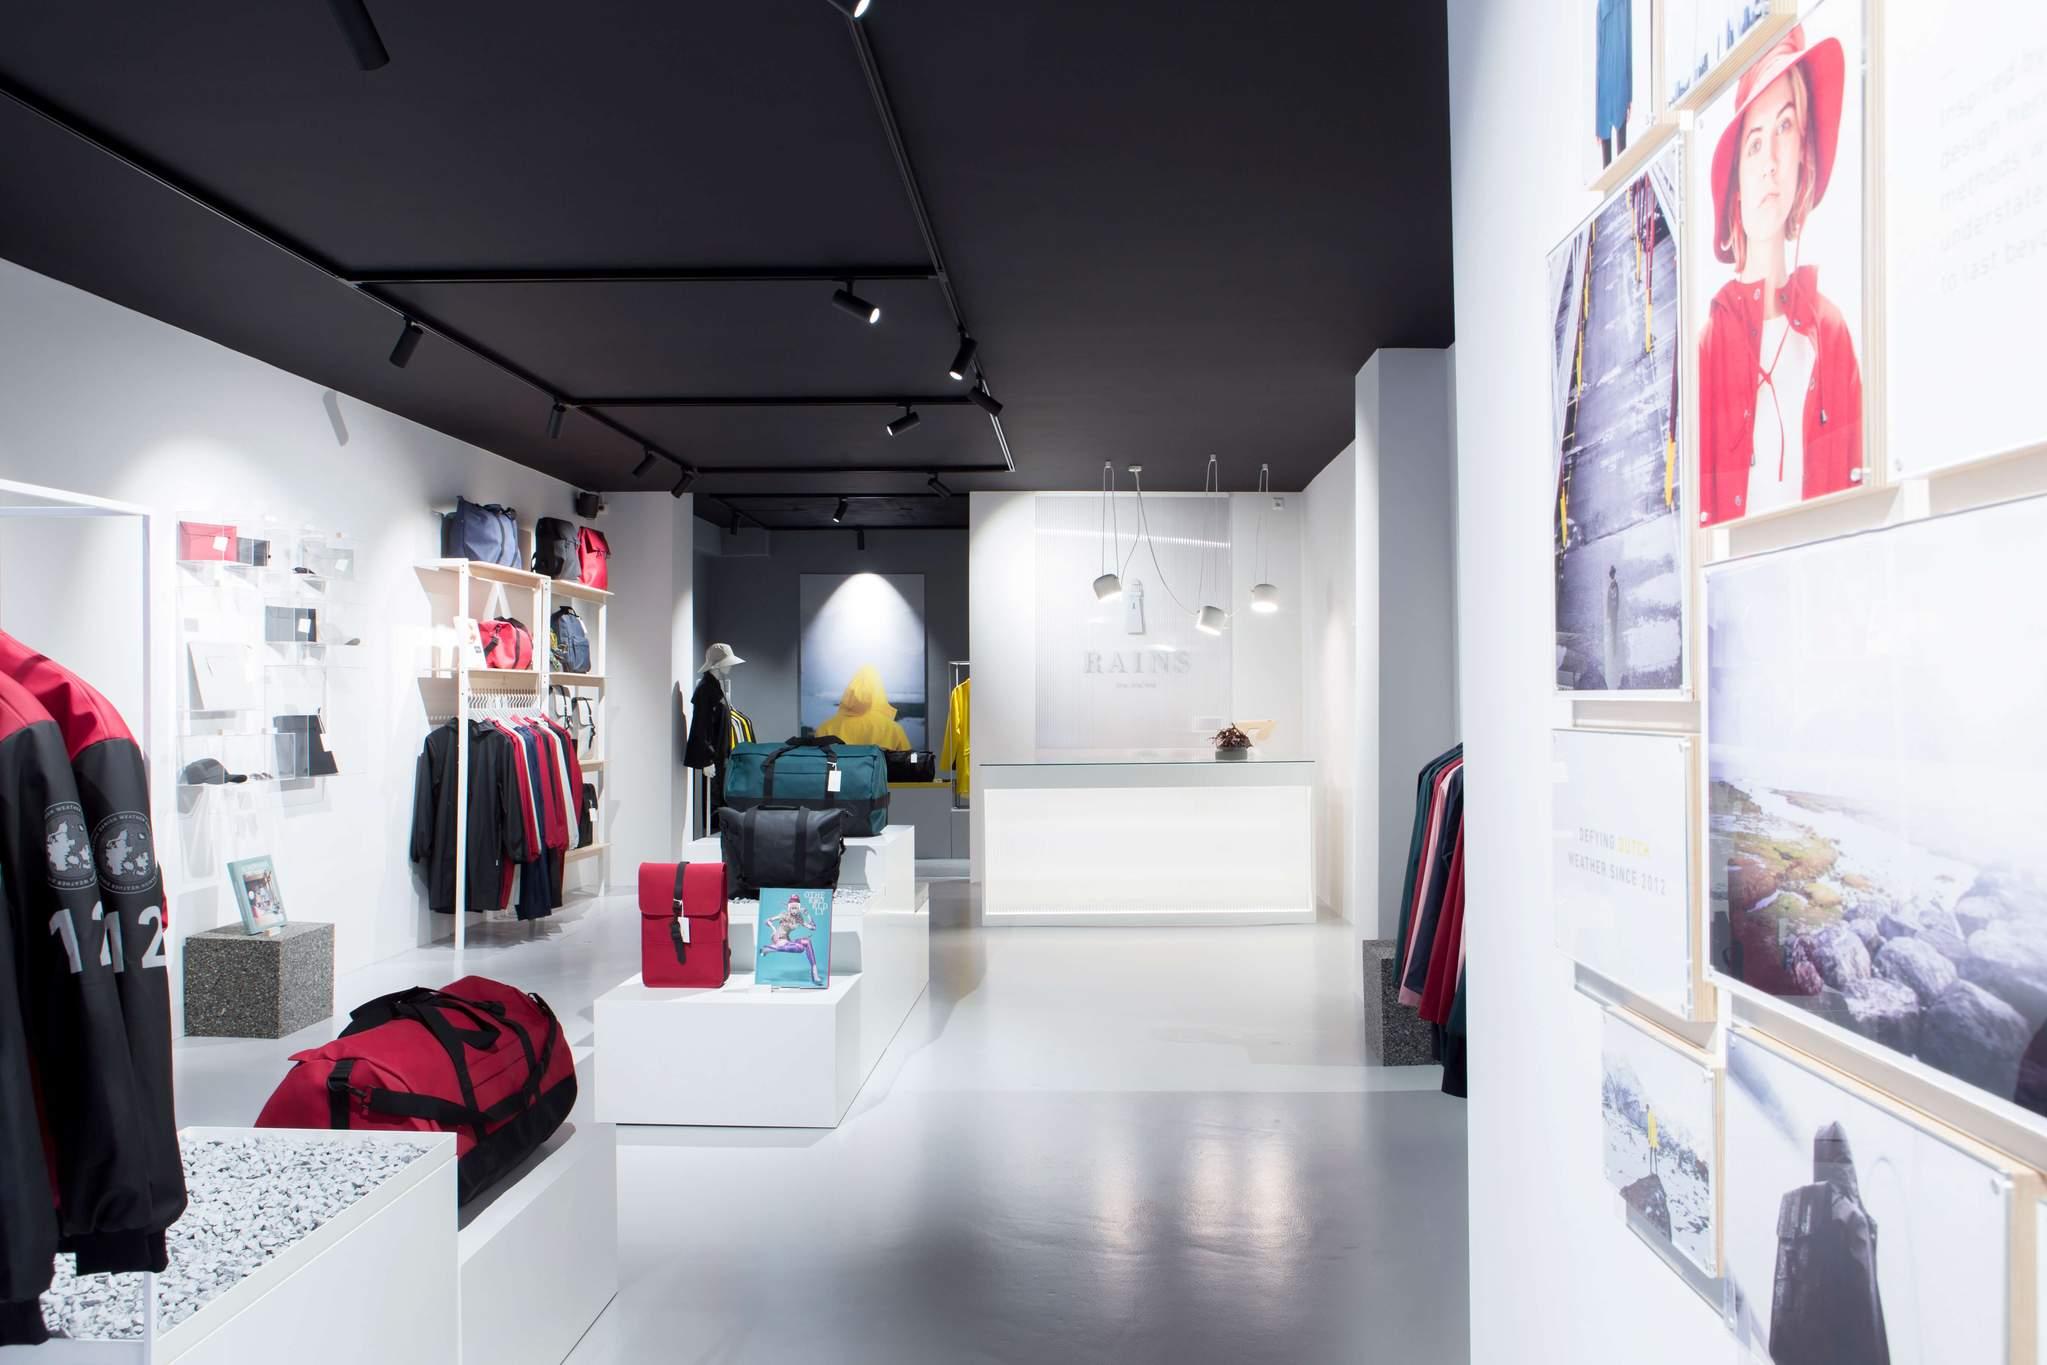 RAINS Store Amsterdam